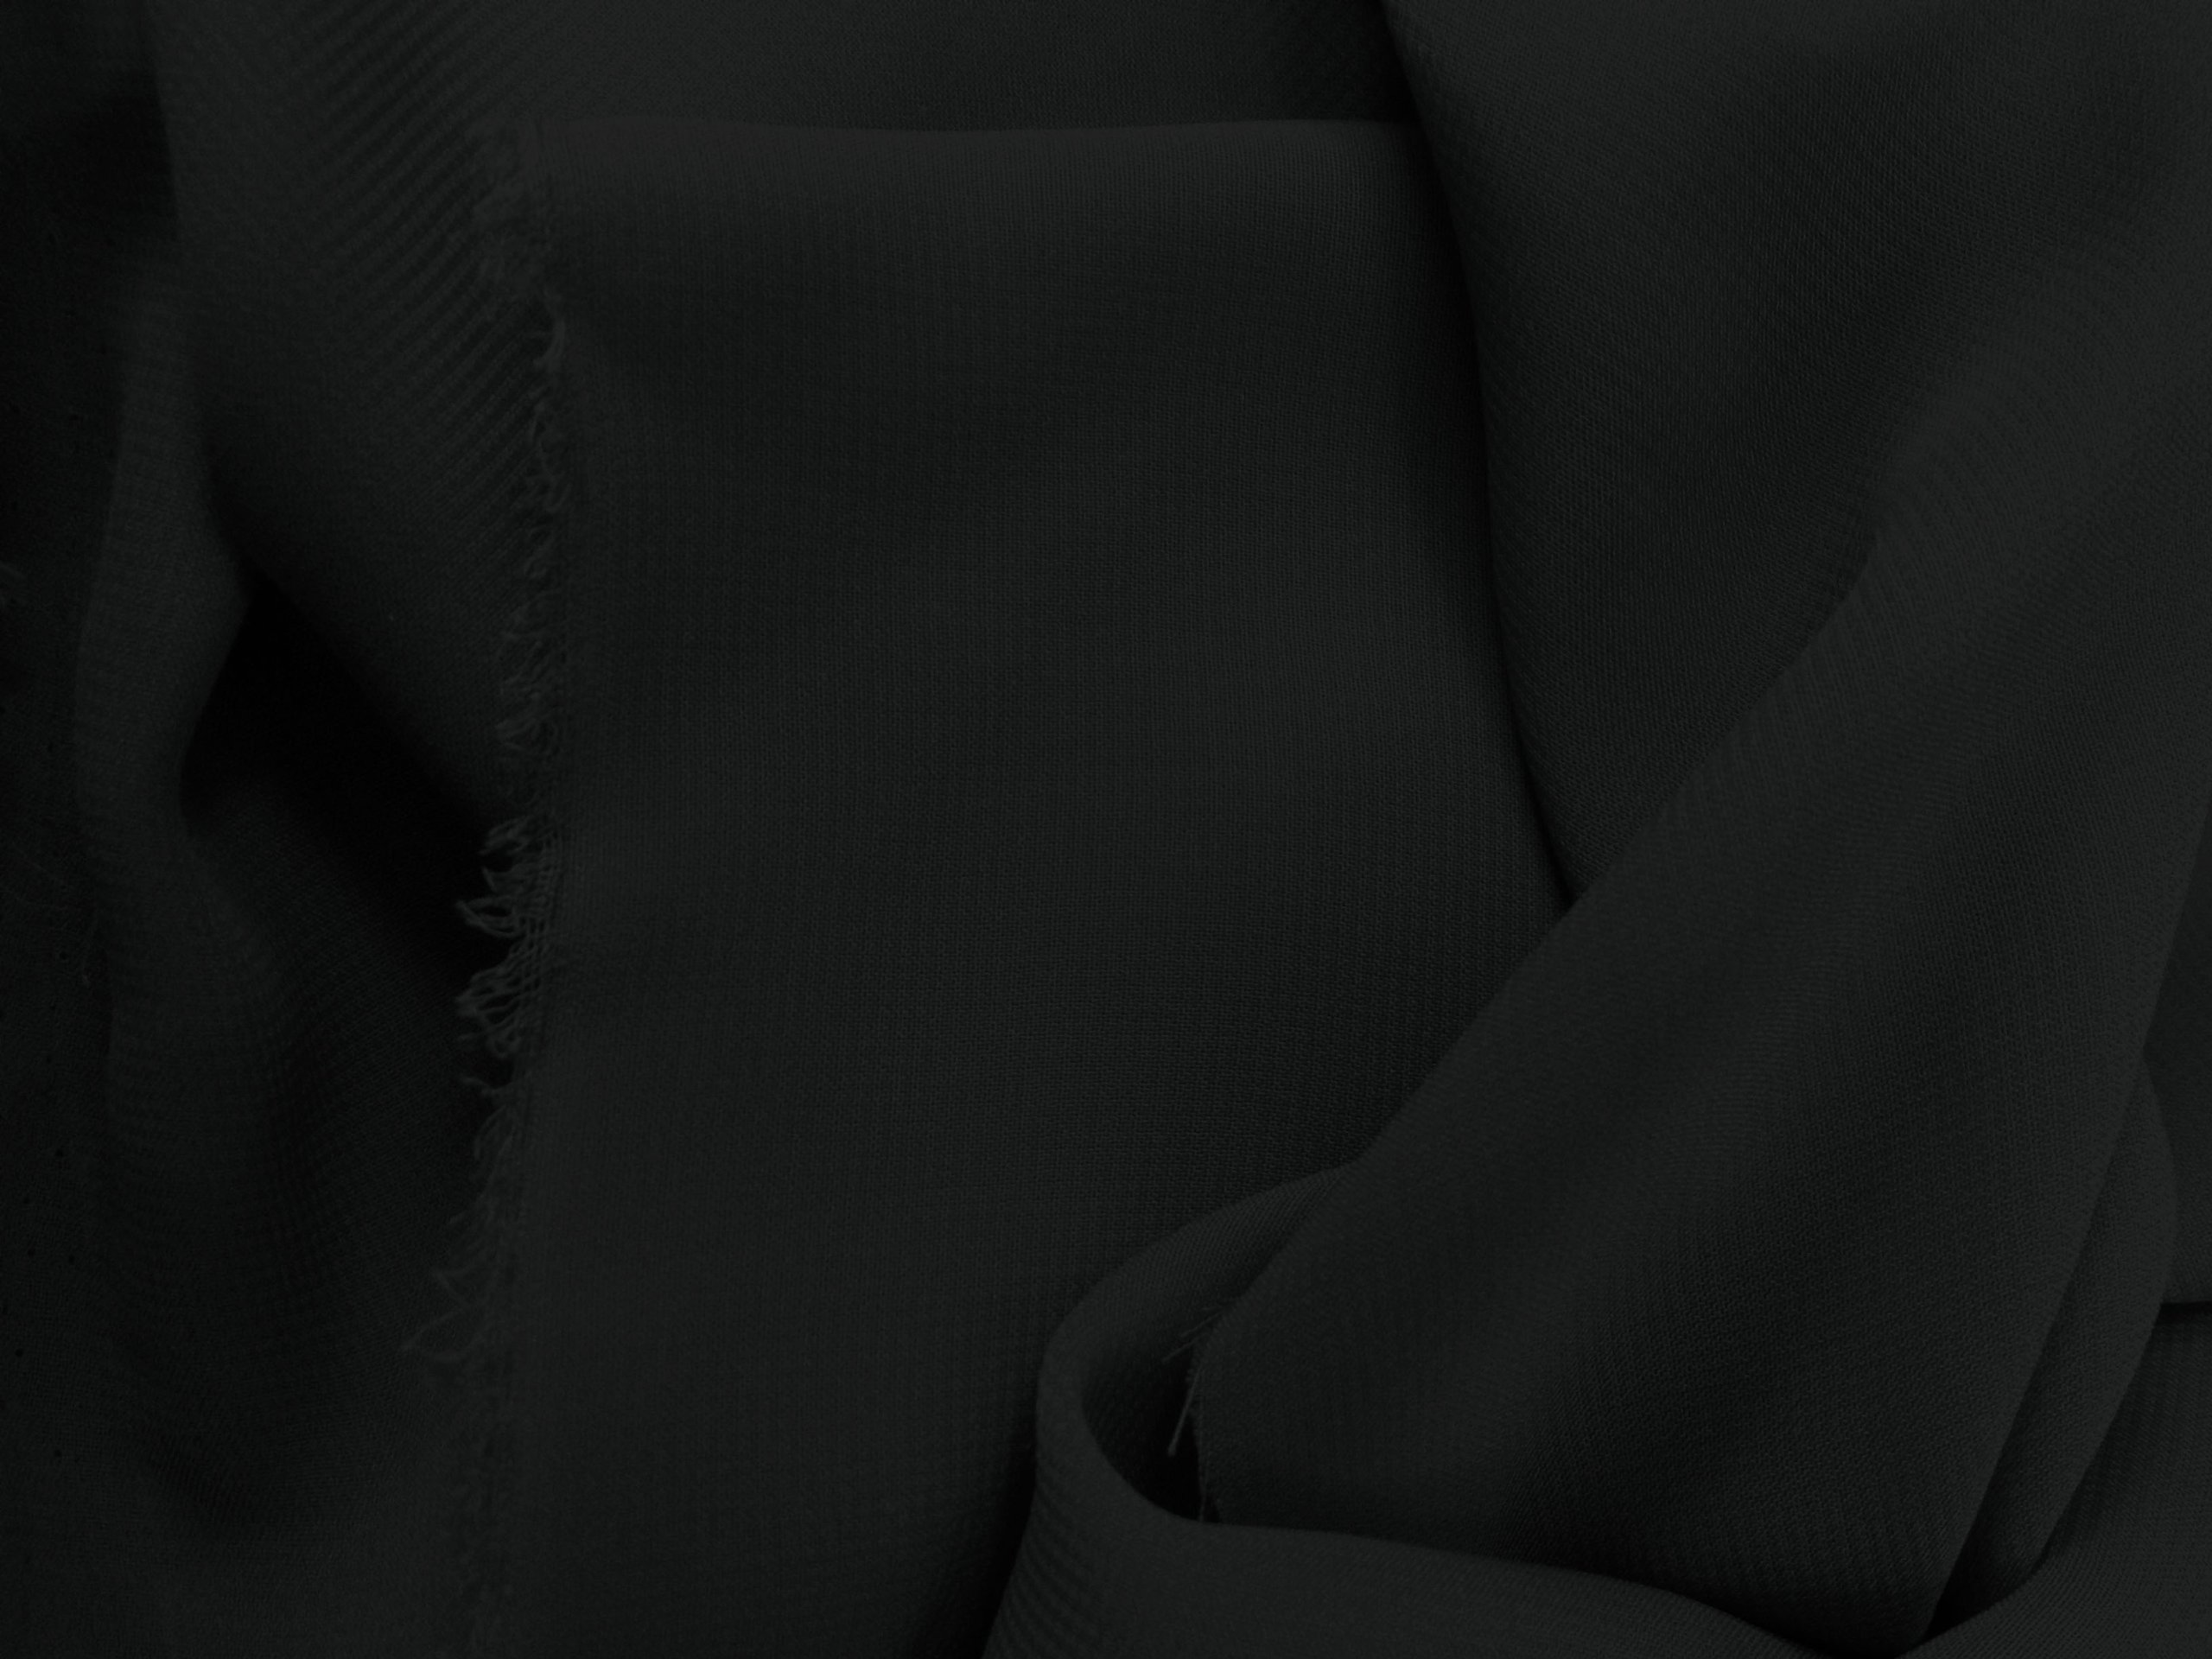 1 X Chiffon Black 58 Inch Fabric By the Yard (F.E.